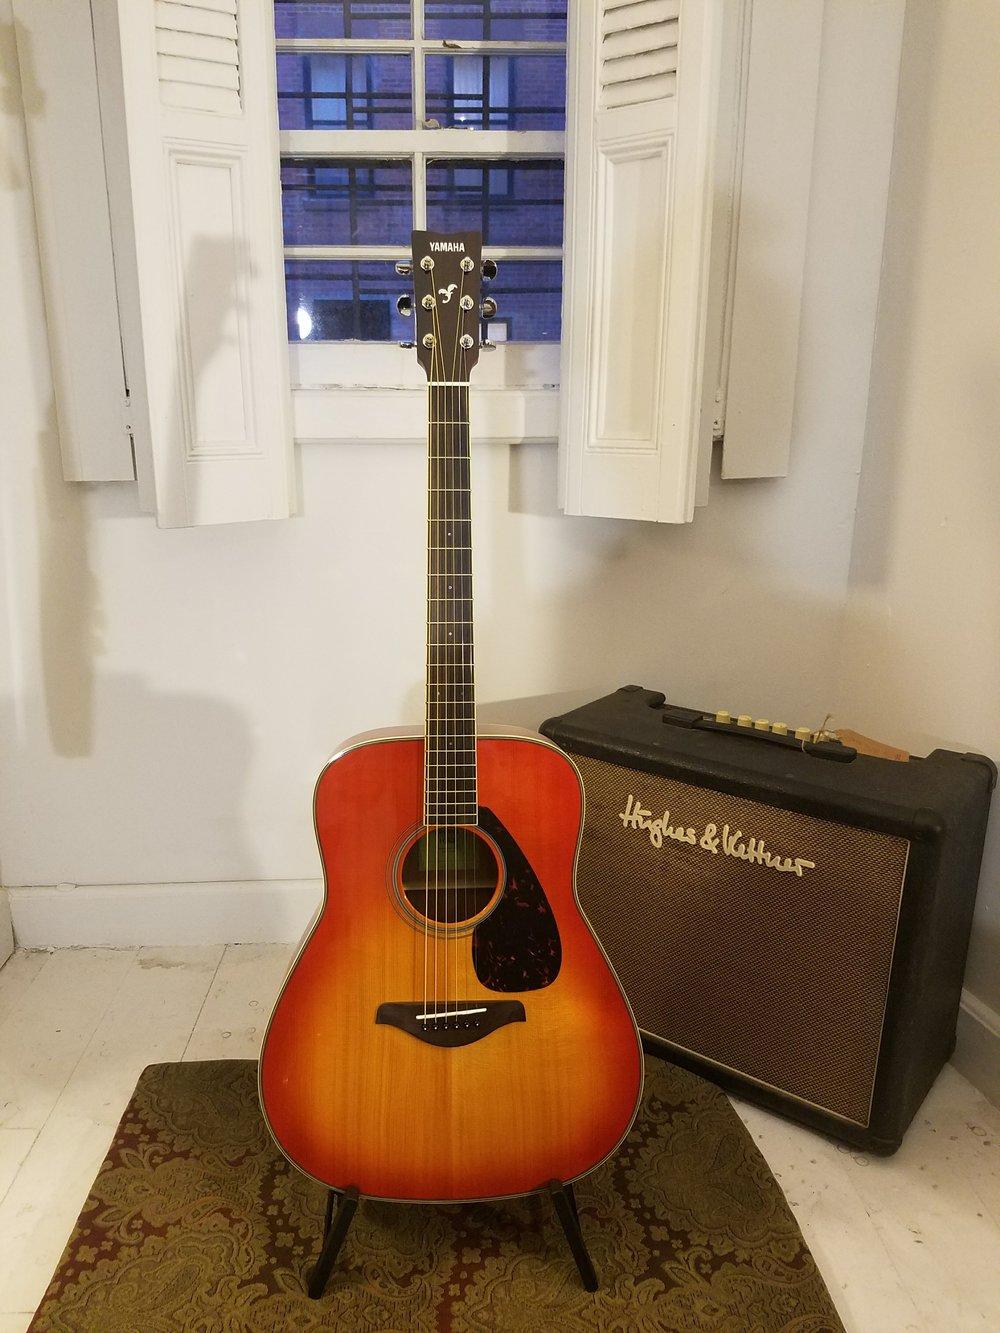 Cheap Acoustic Guitars-Brooklyn fine guitars.